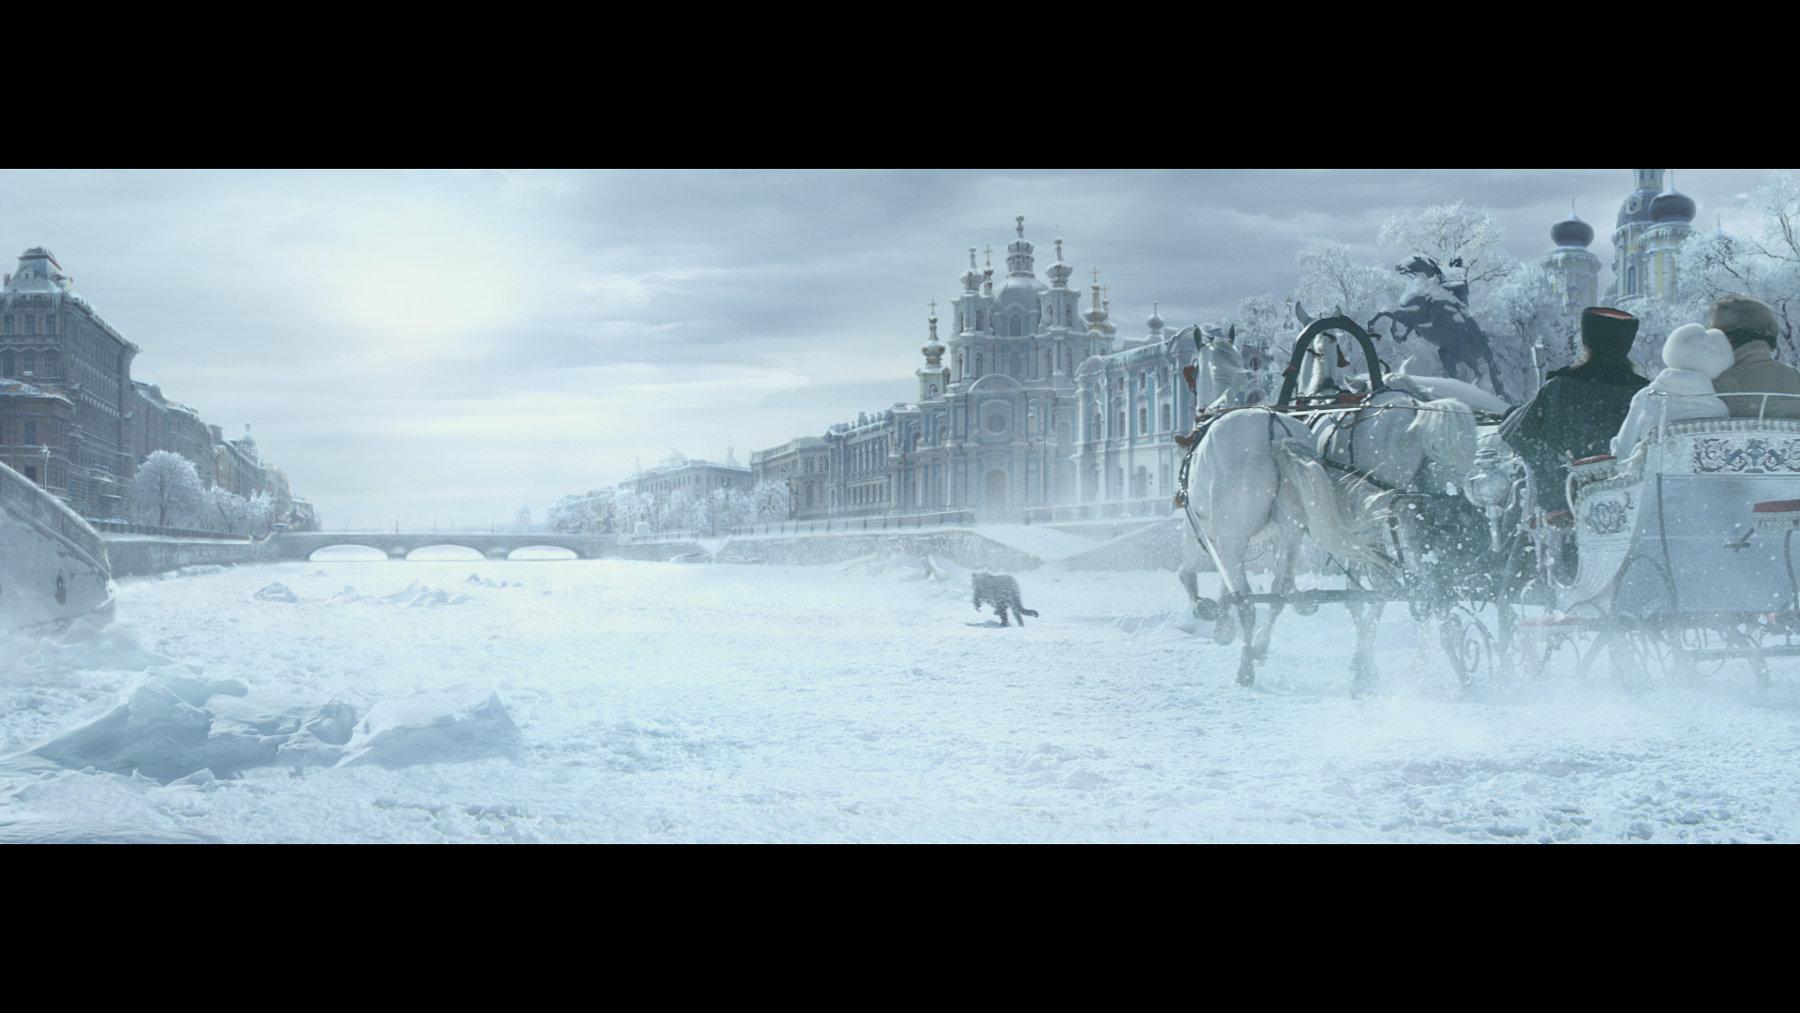 L'Odyssée de Cartier - The Panther St Petersburg Scene